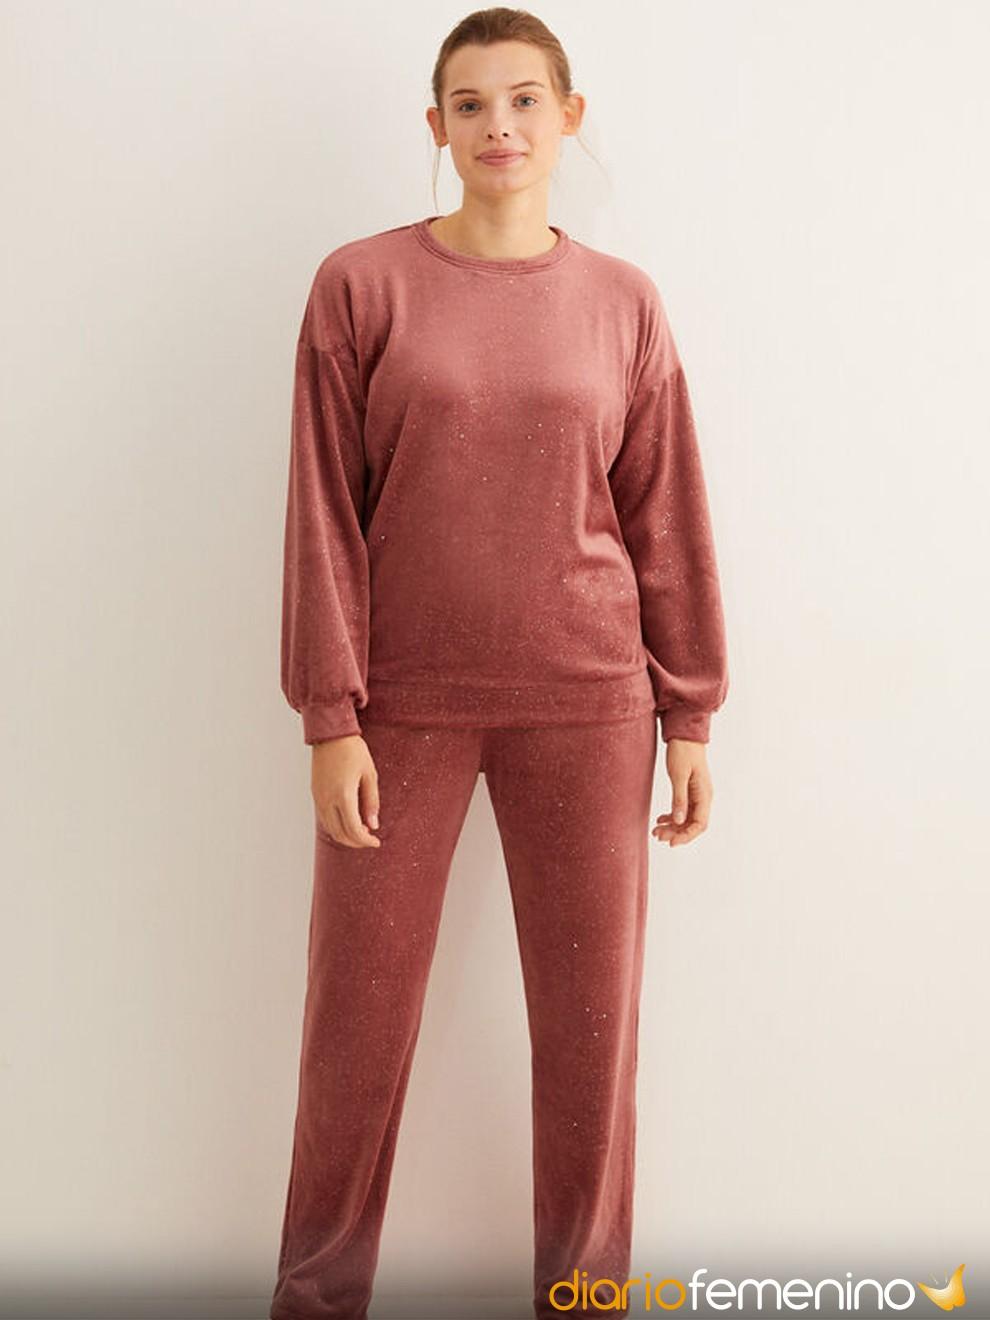 Pijama color teja con lunares de Women'secret para Nochevieja 2020/2021